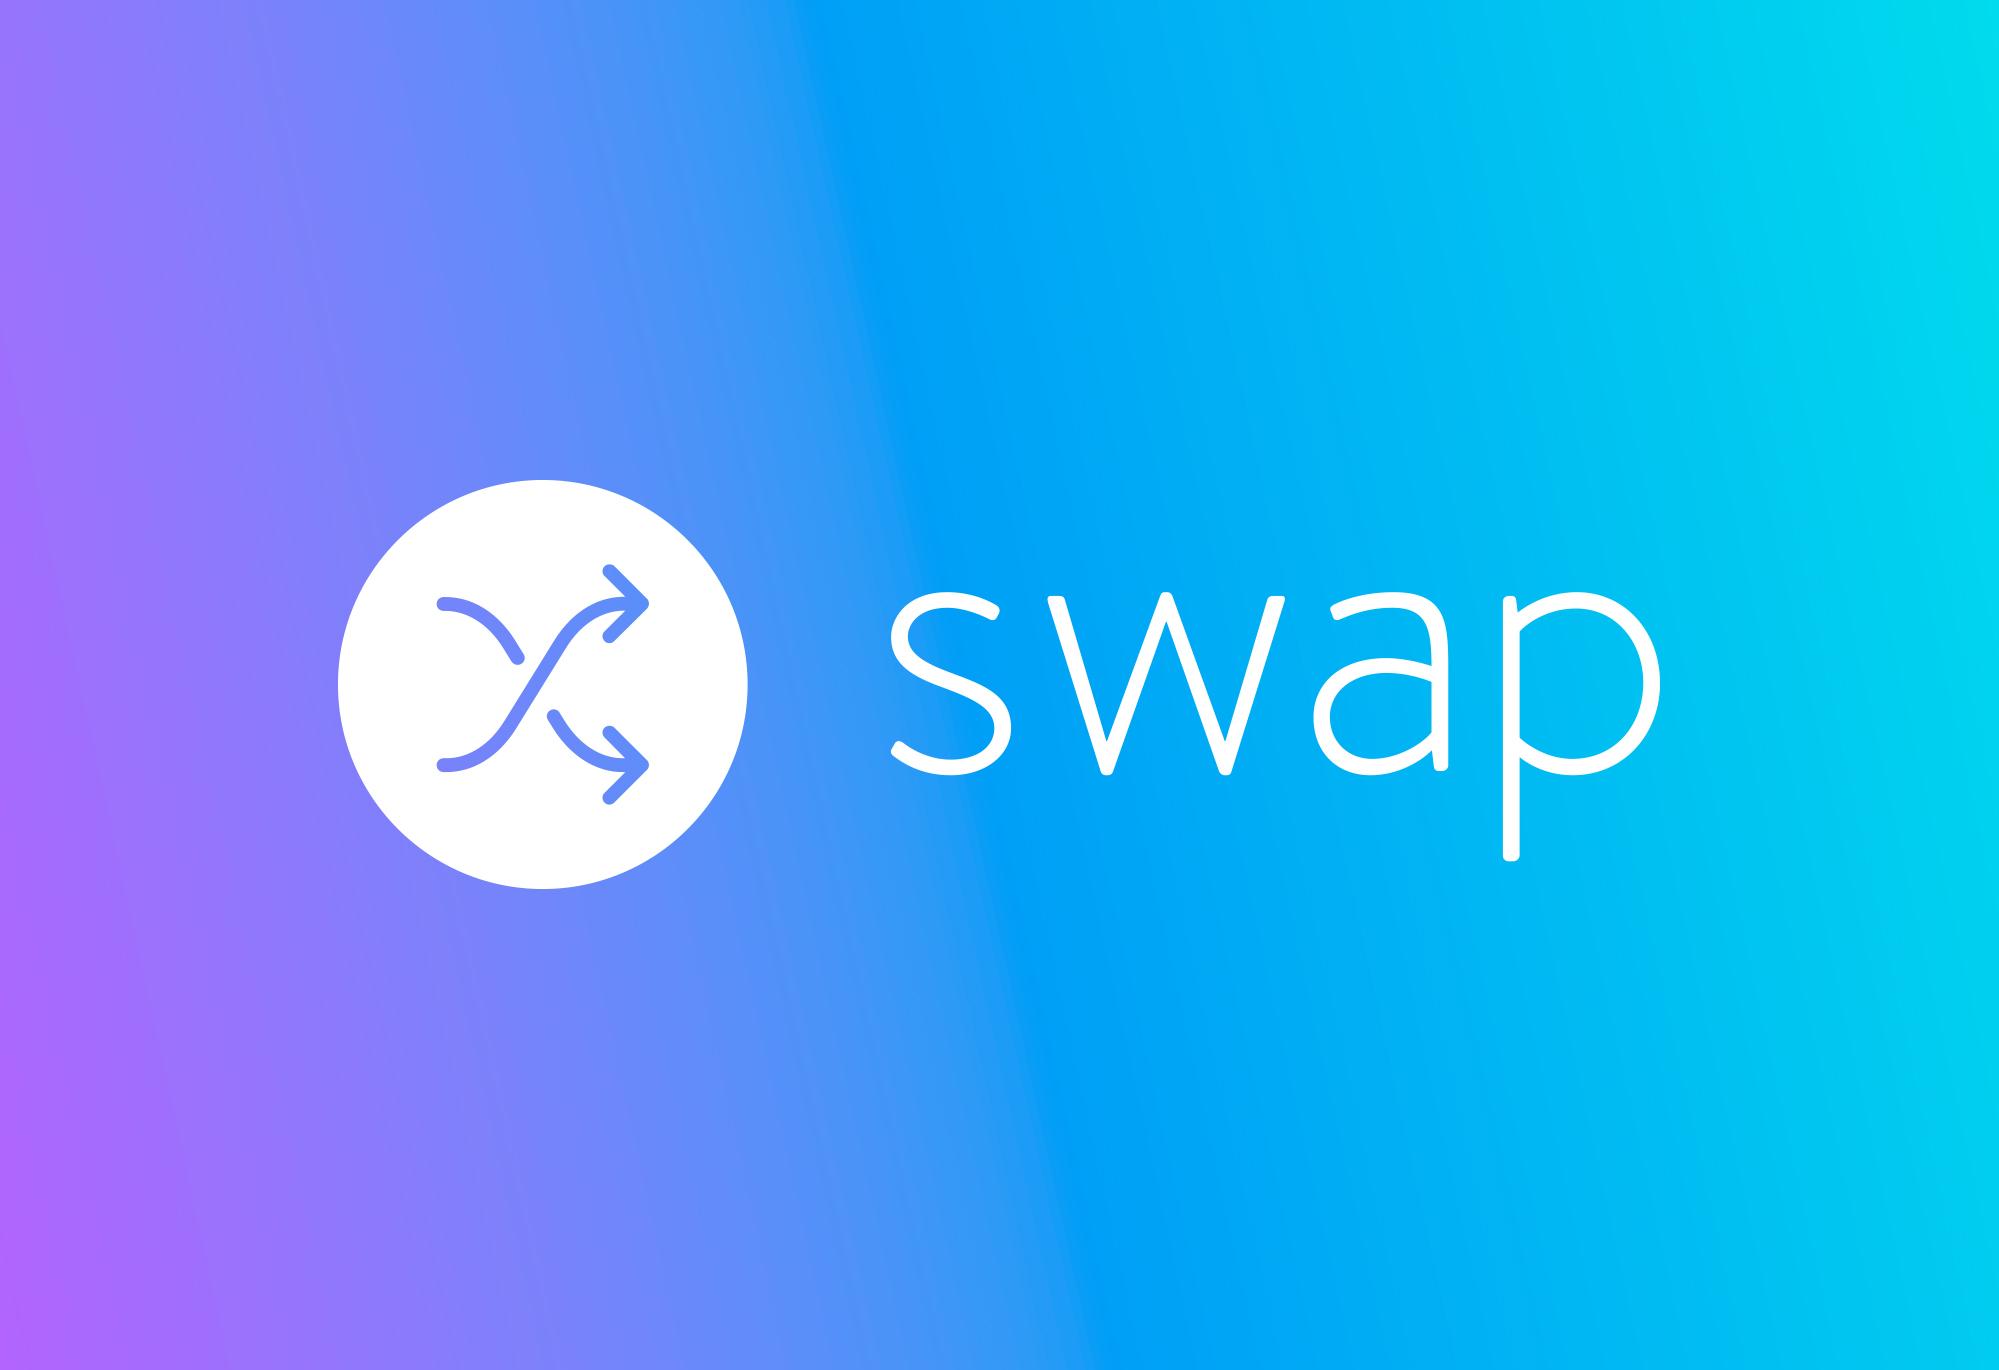 Swap (XWP) coin logo